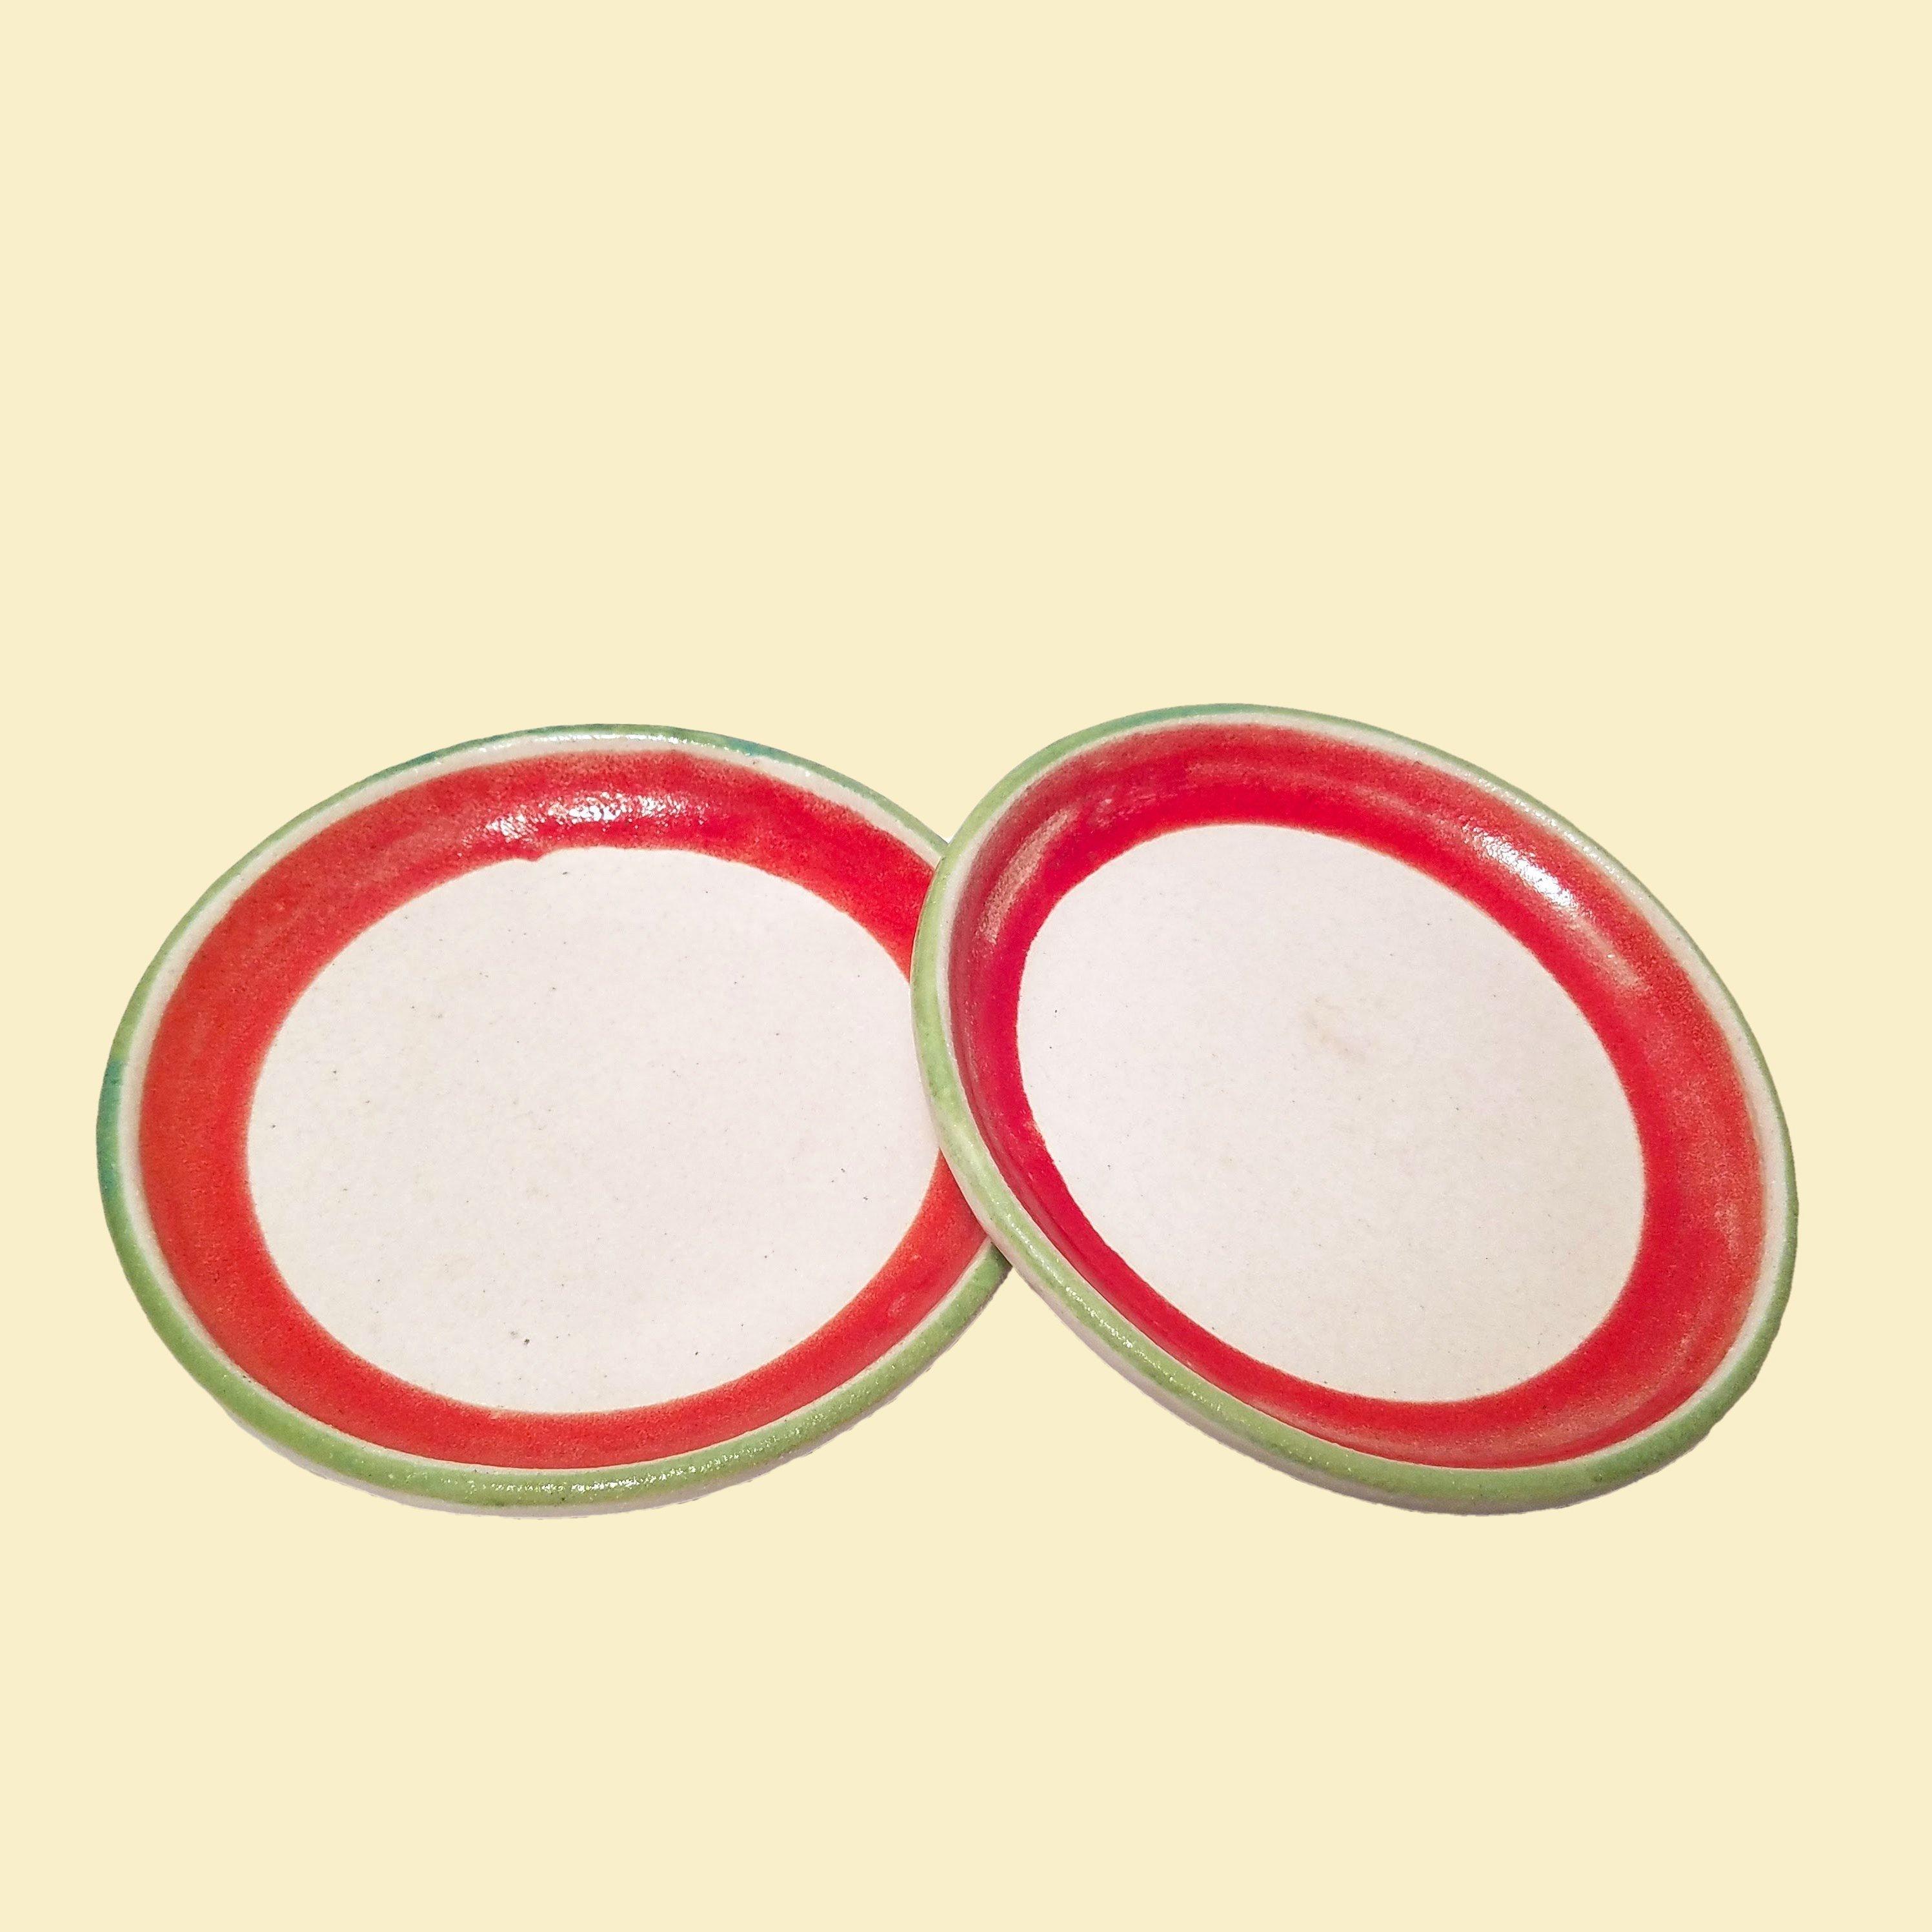 20% OFF - Desimone Ceramics Small Majolica Plates Hand Painted 00000